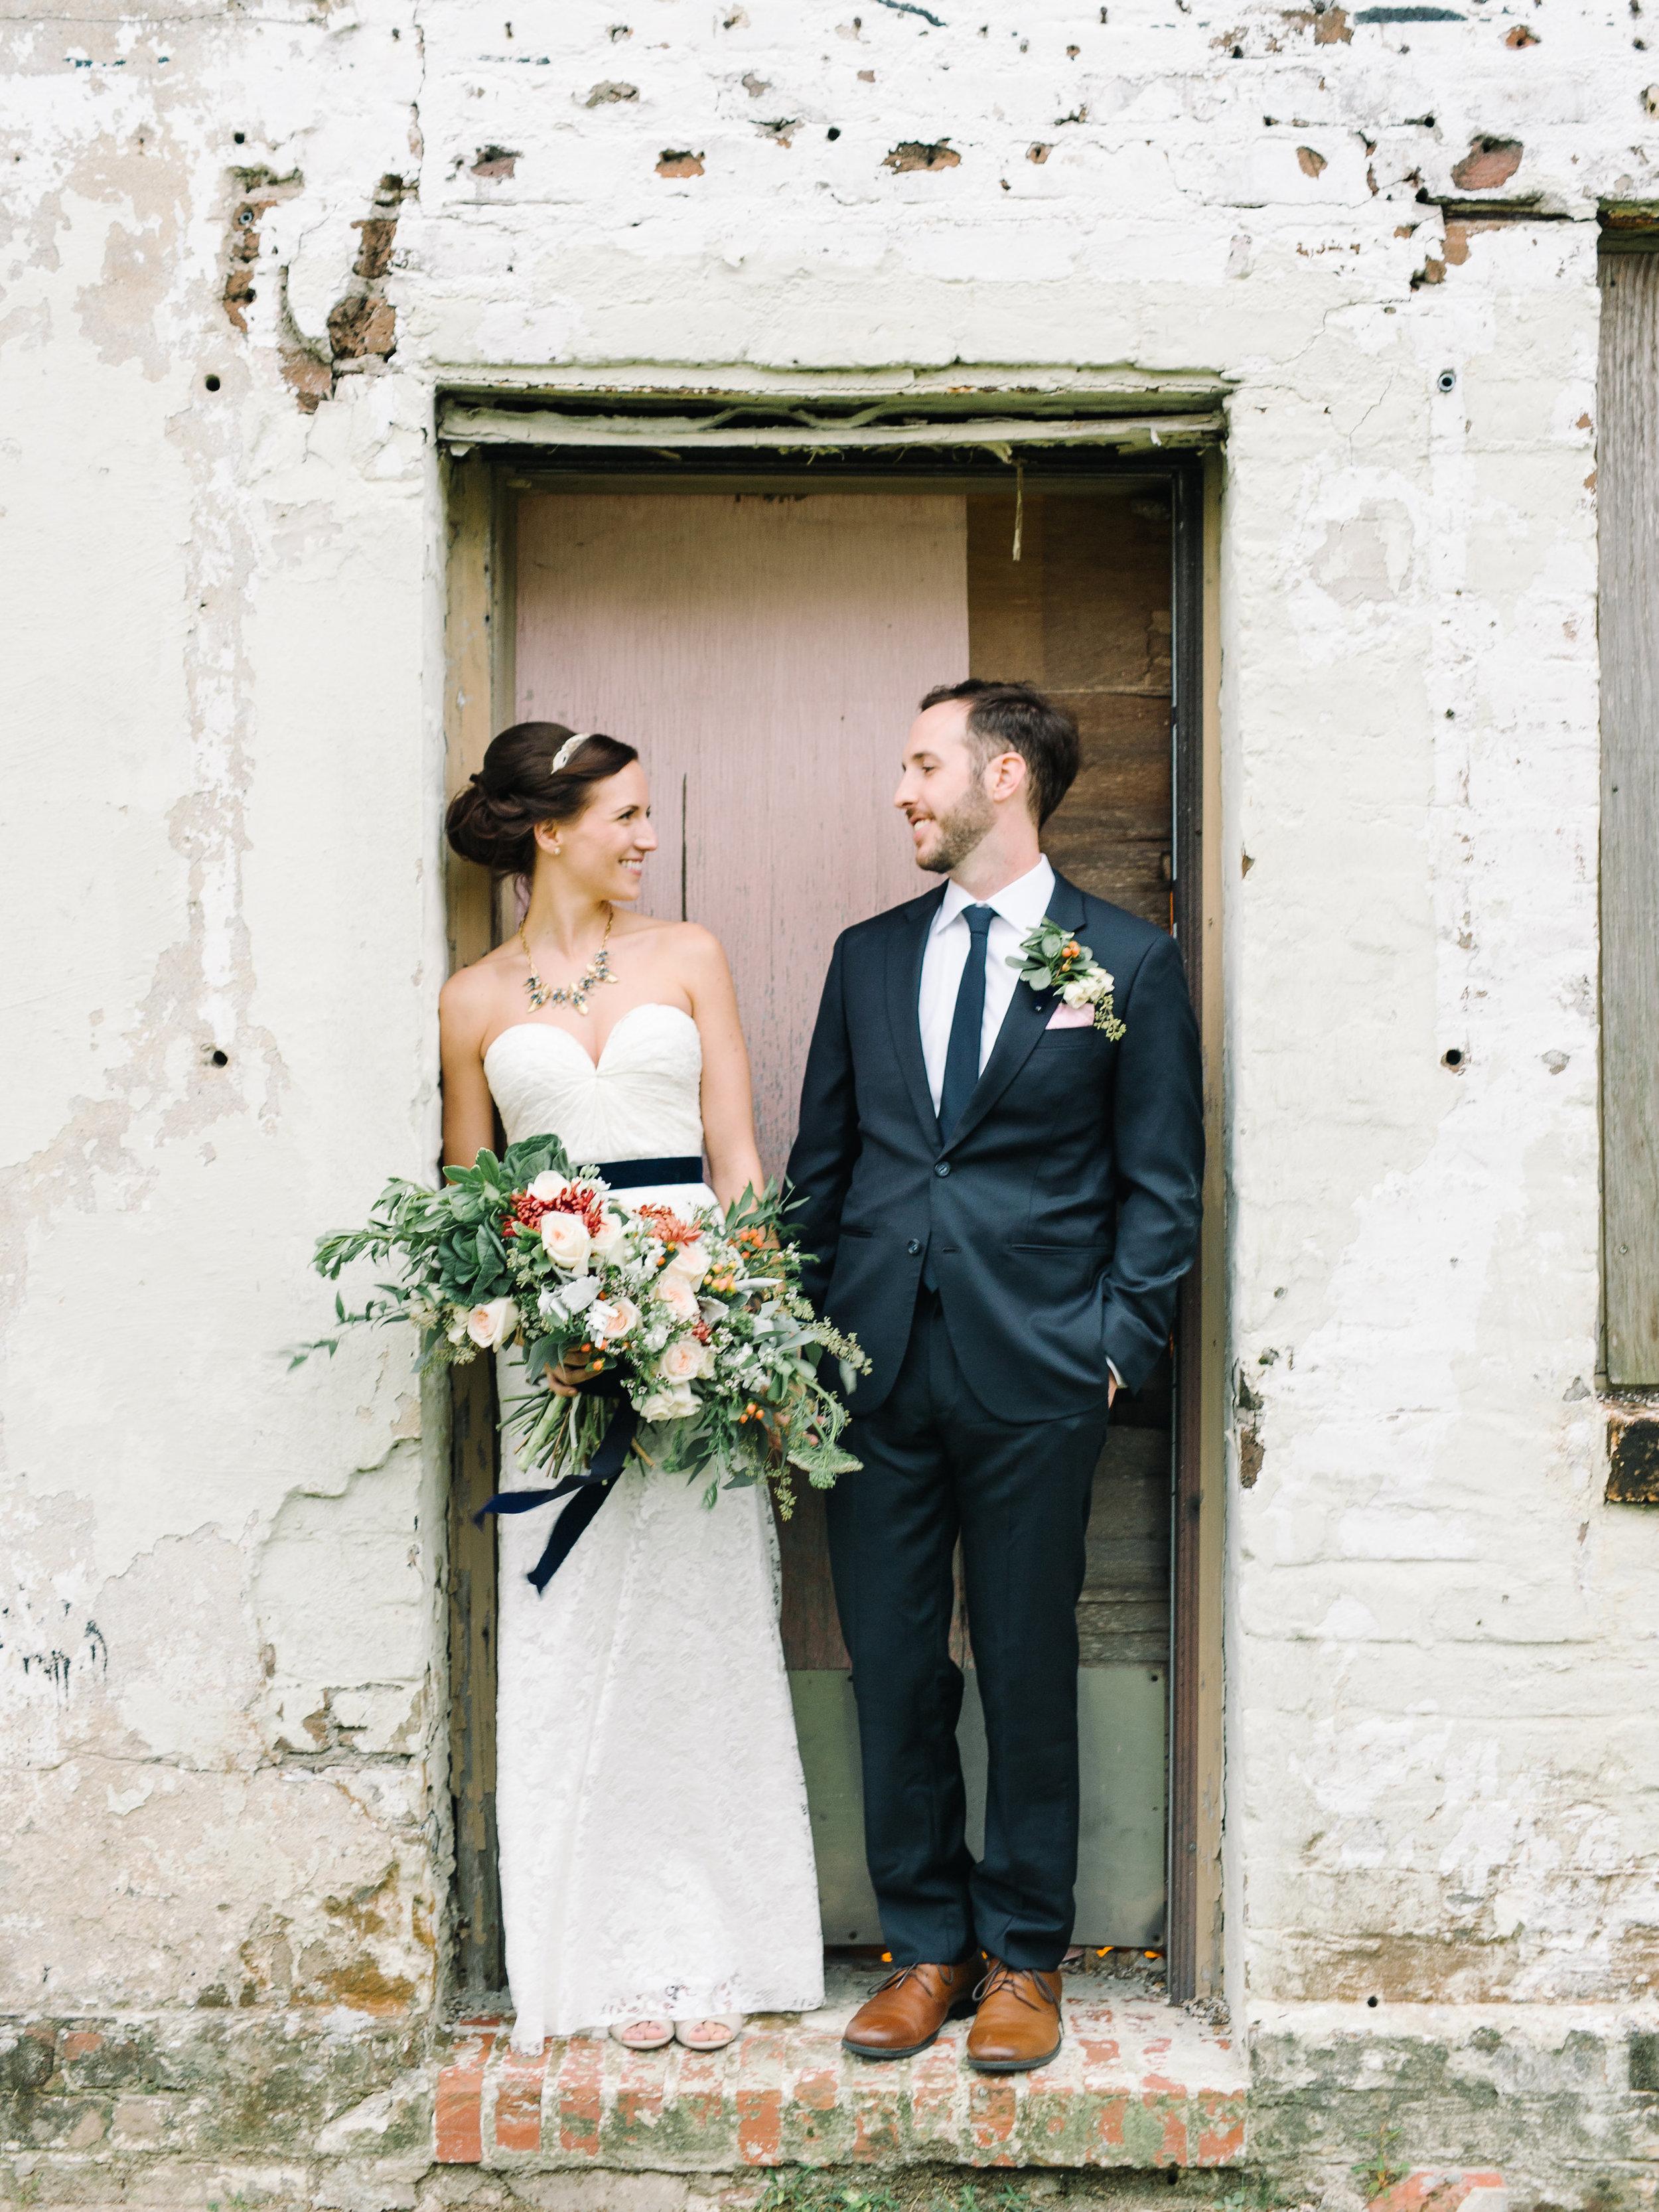 amber-and-paul-rach-loves-troy-charles-h-morris-center-wedding-sarah-seven-helene-lace-wedding-dress-ivory-and-beau-bridal-boutique-savannah-wedding-planner-savannah-event-designer-savannah-florist-savannah-weddings-savannah-bridal-boutique-33.jpg